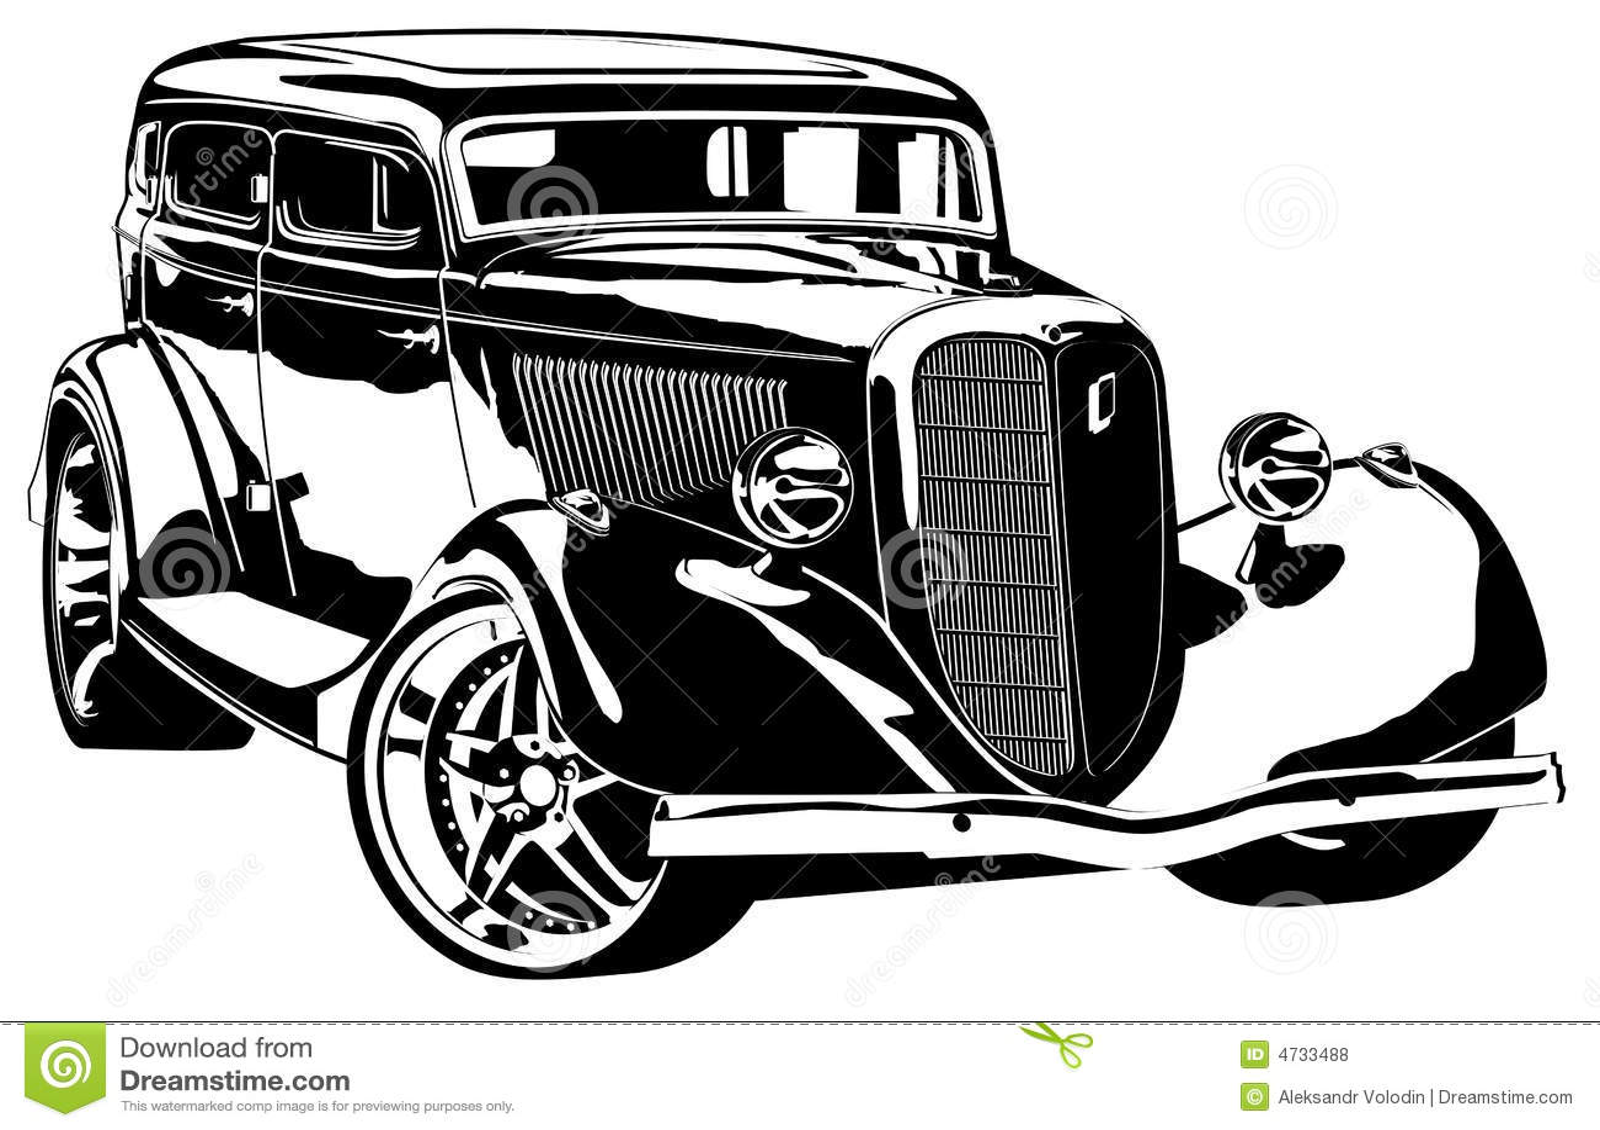 Custom Car Cover Royalty Free